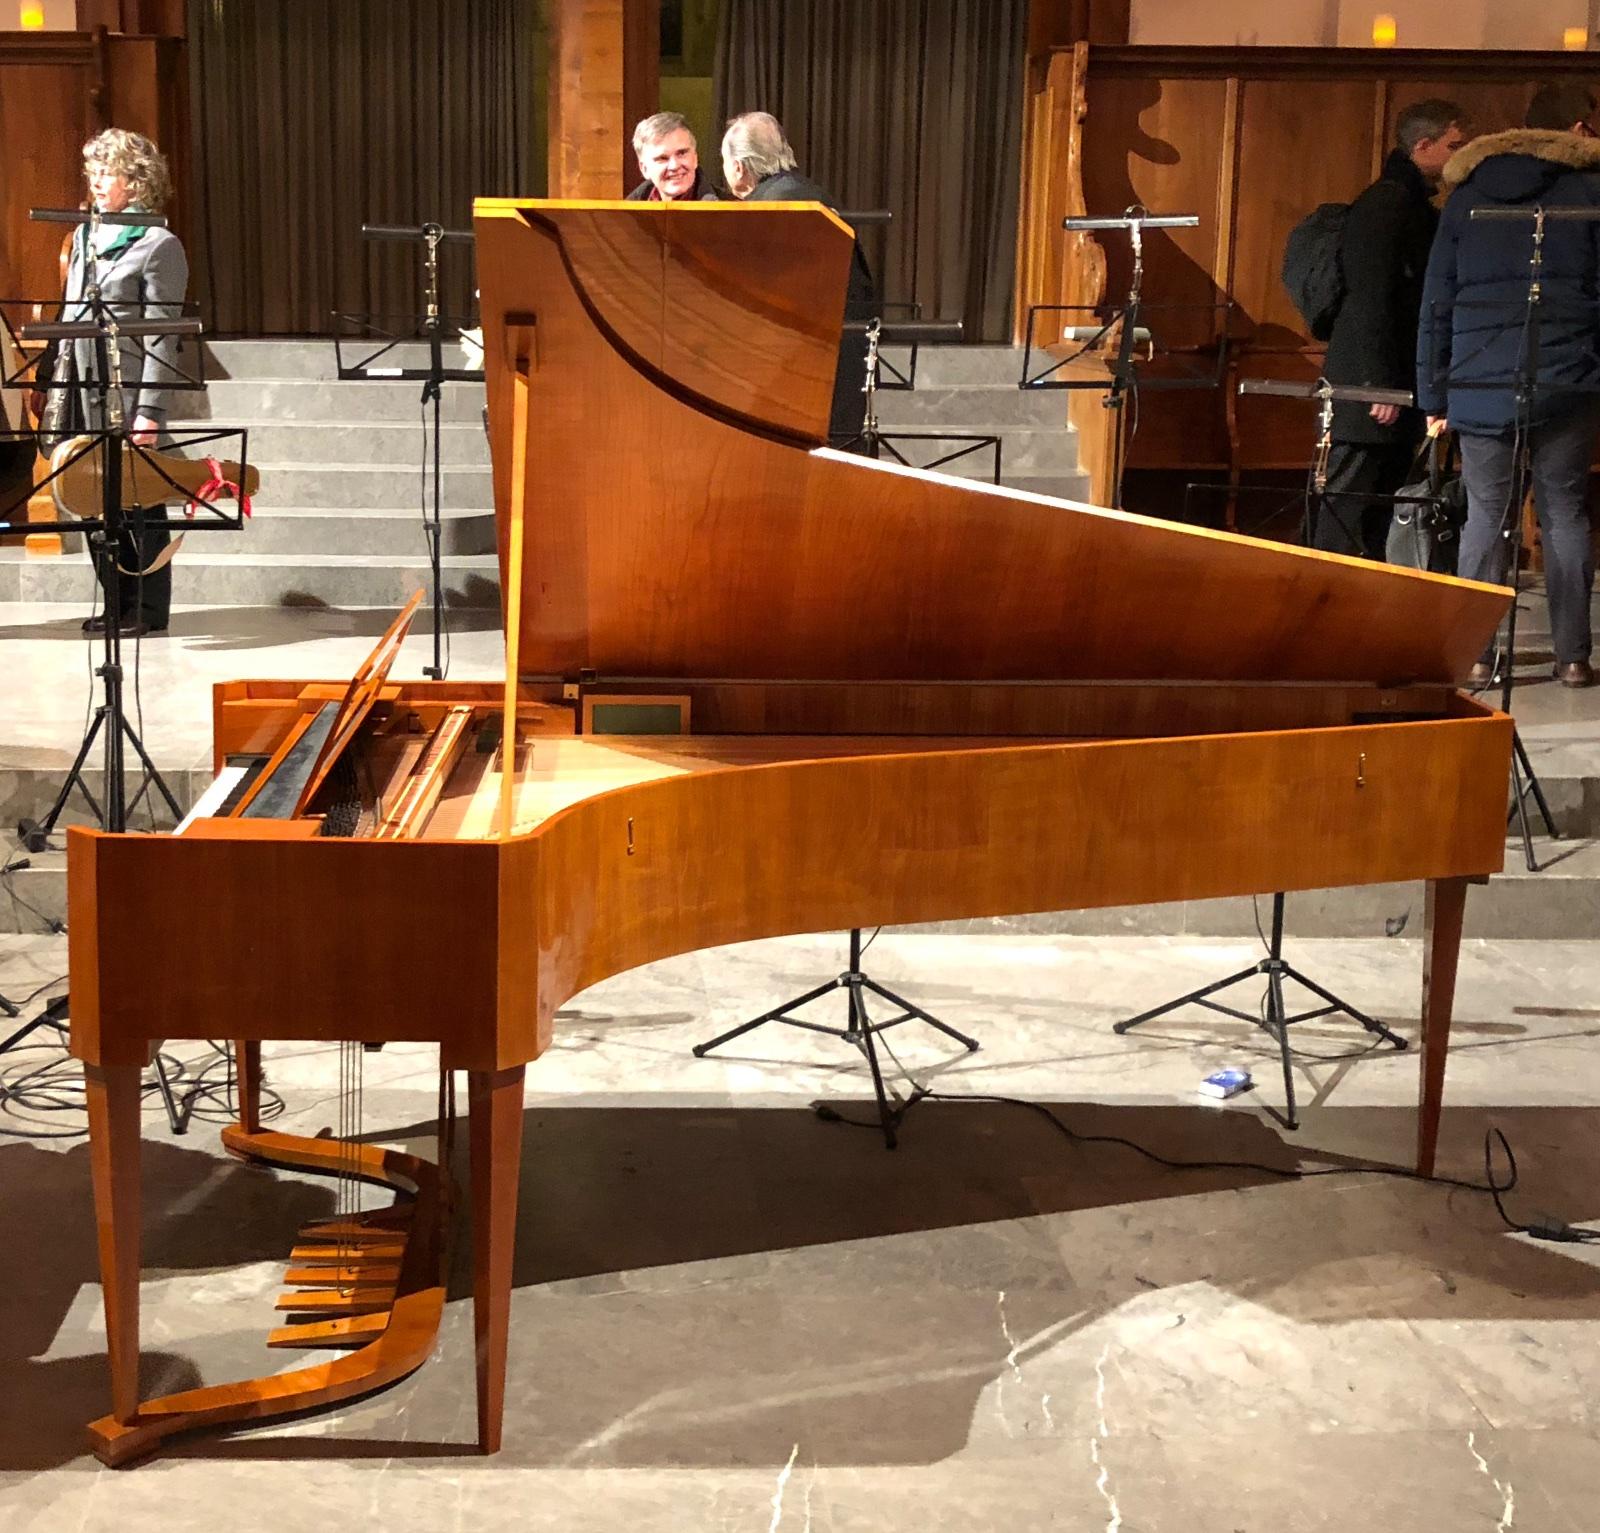 Concert Bezuidenhout / ZKO @ St.Peter, Zurich, 2018-03-07, fortepiano (photo © Rolf Kyburz)